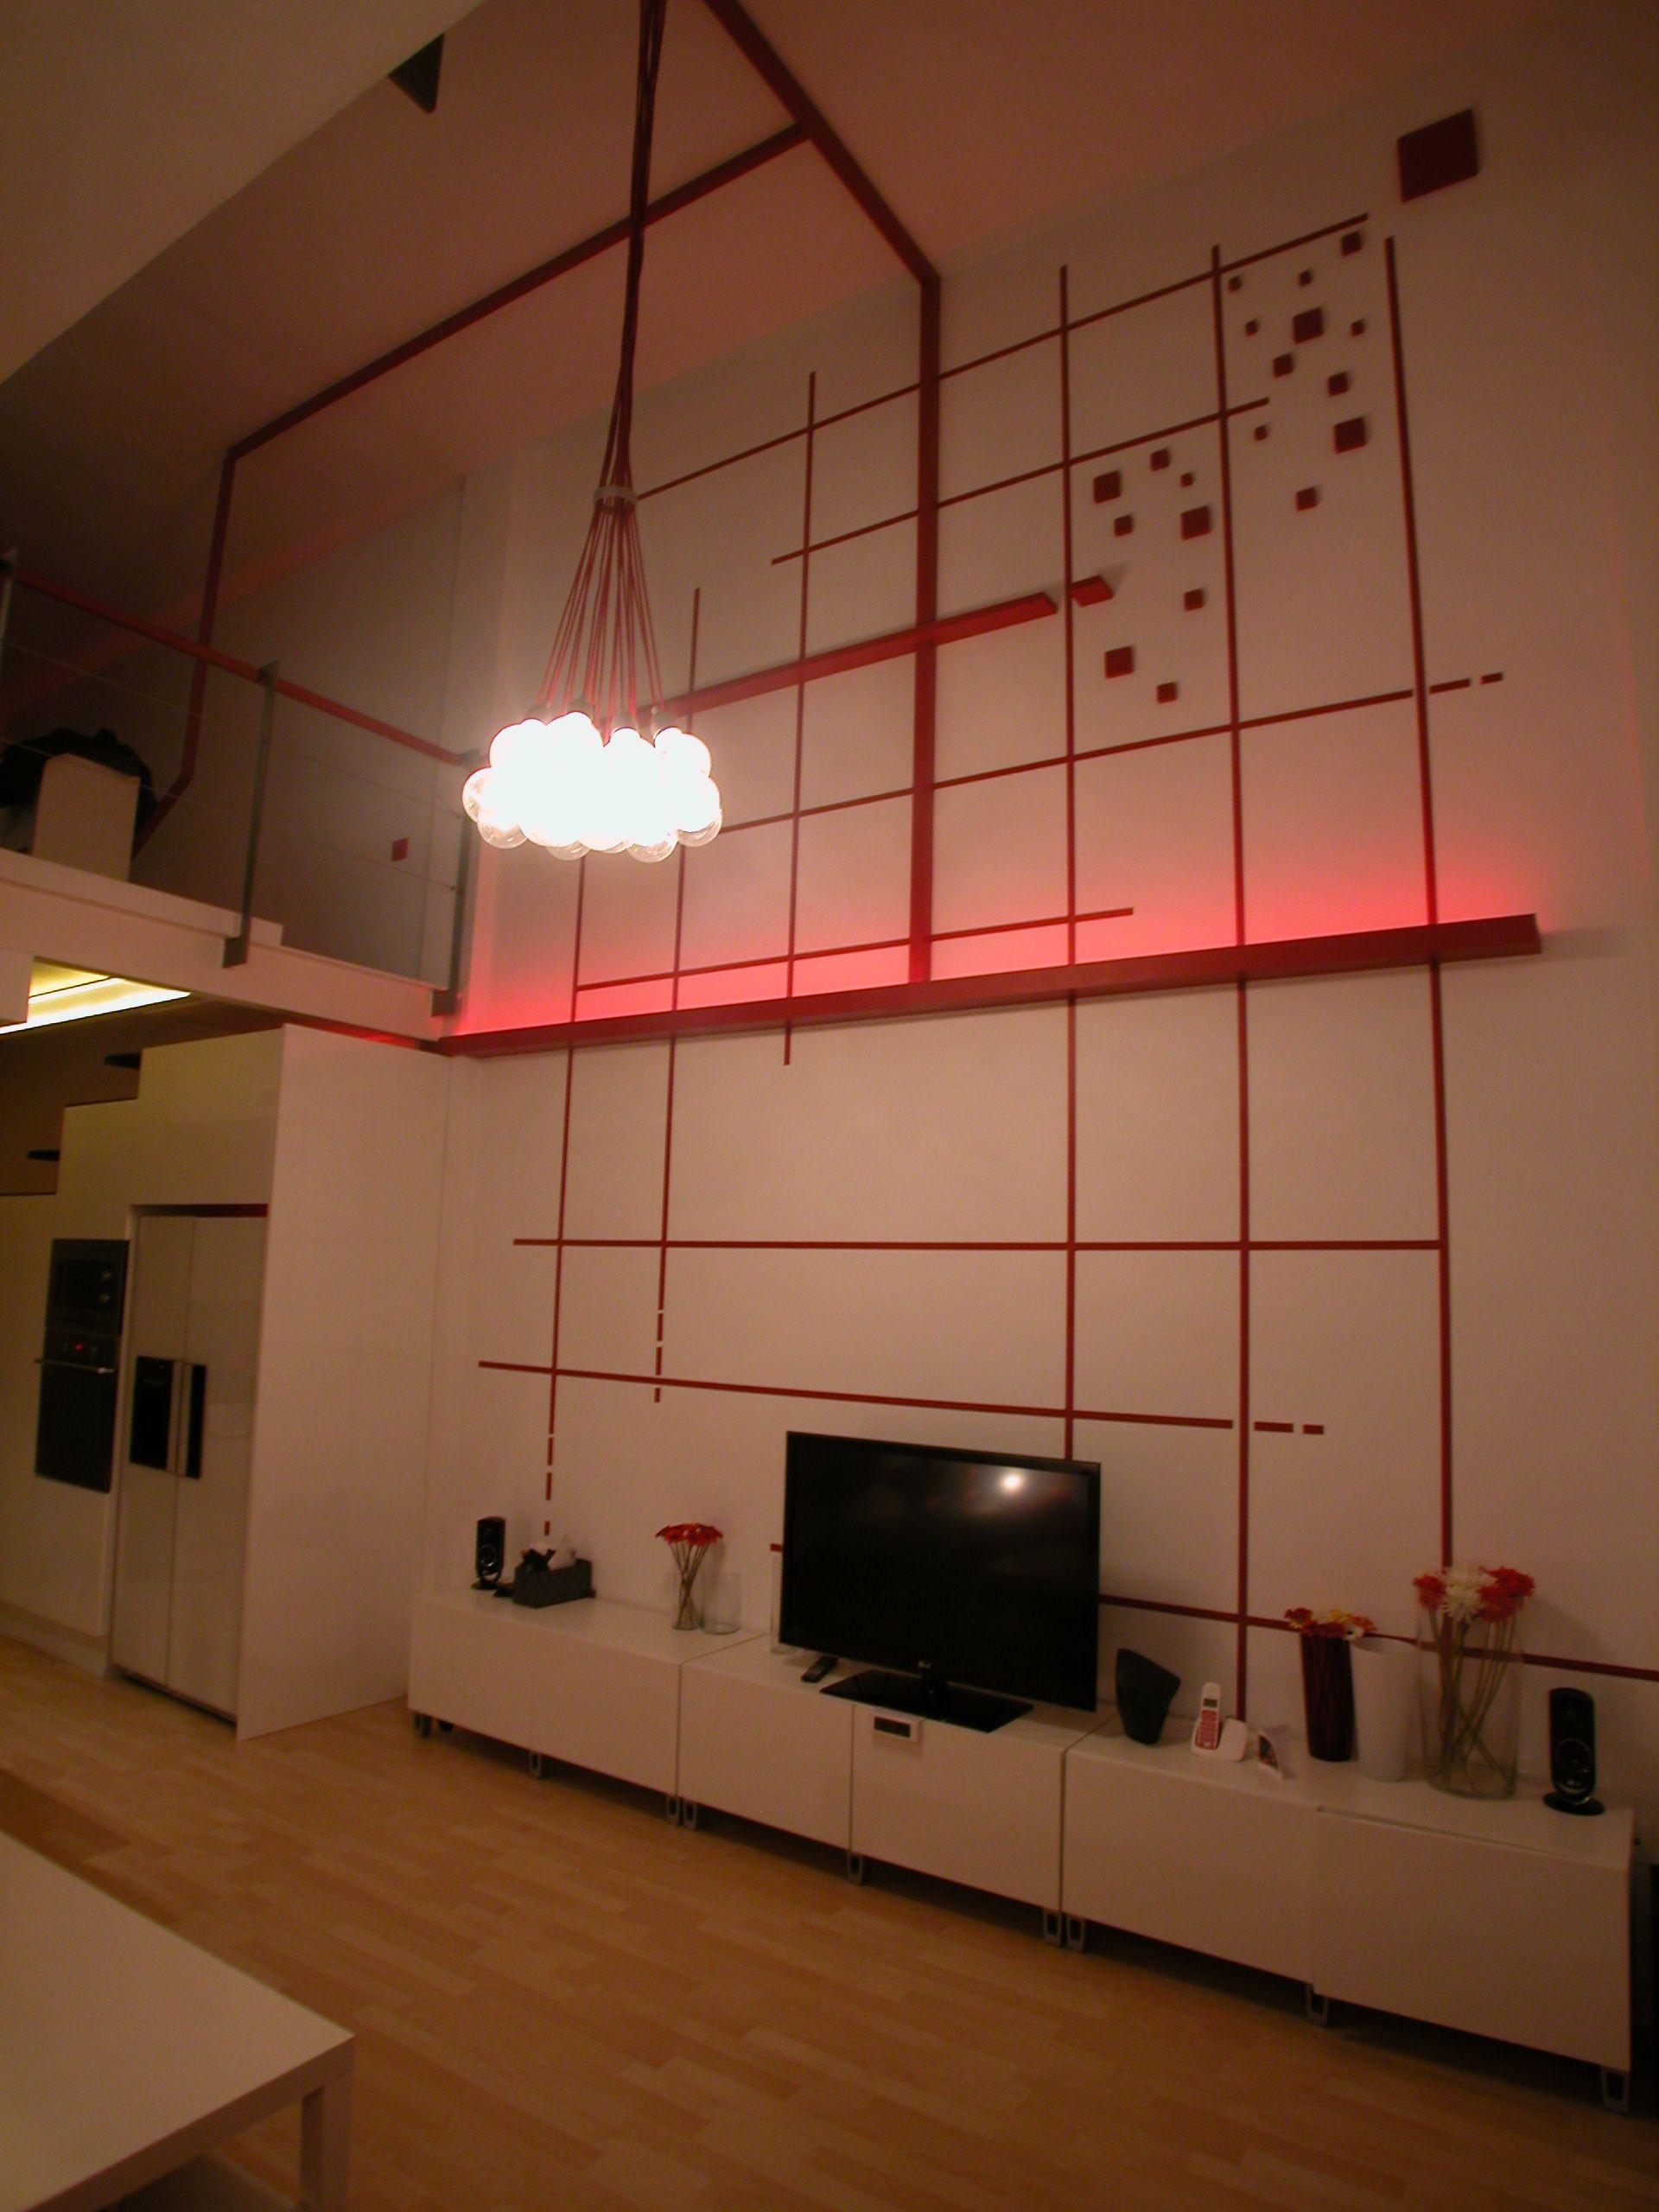 Ideas de decoracion de comedor salon loft estilo - Decoracion estilo loft ...